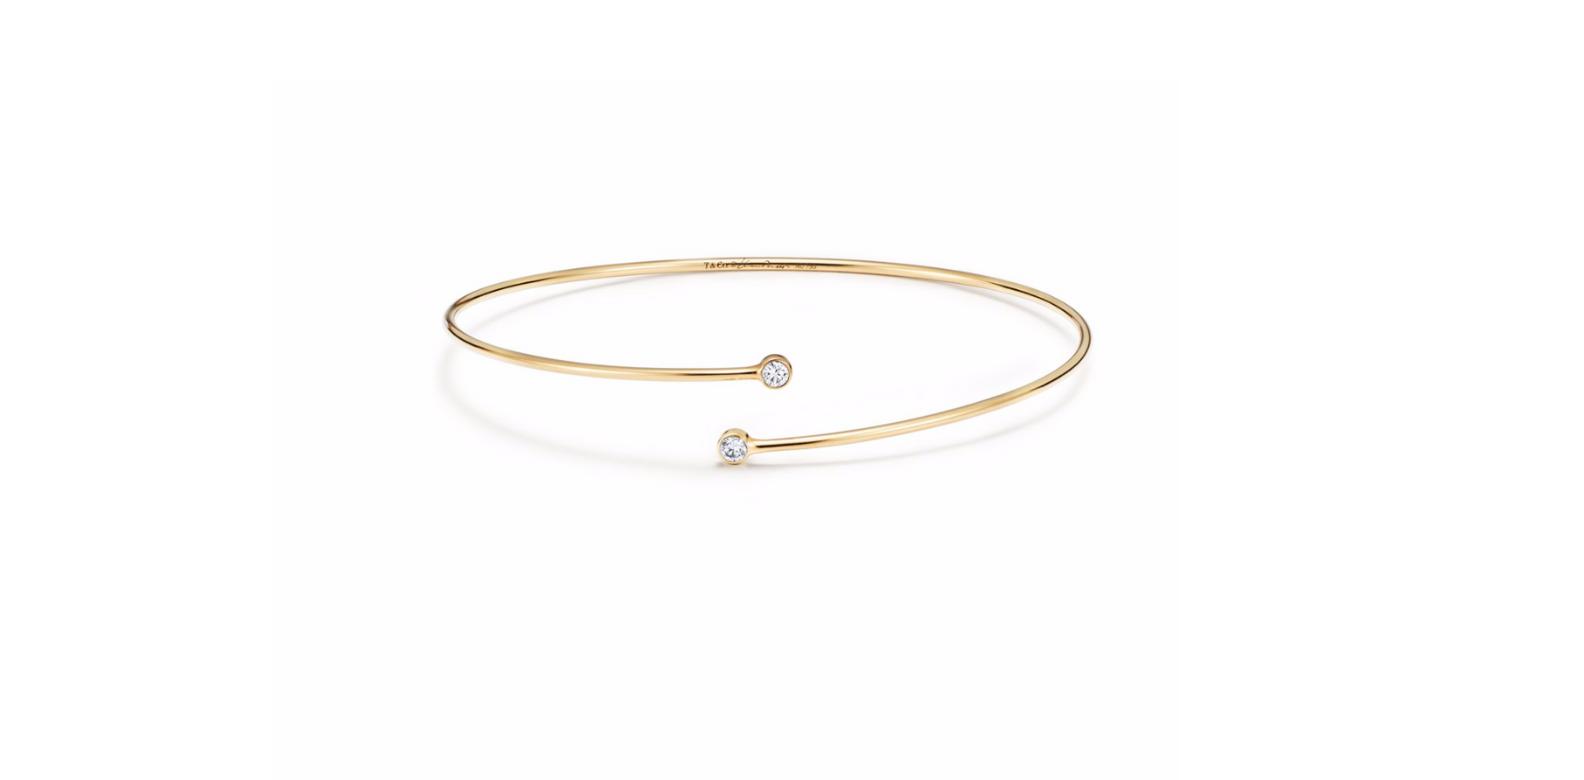 6e37b018613 Why Tiffany s Elsa Peretti Jewellery Is The Perfect Christmas Gift ...